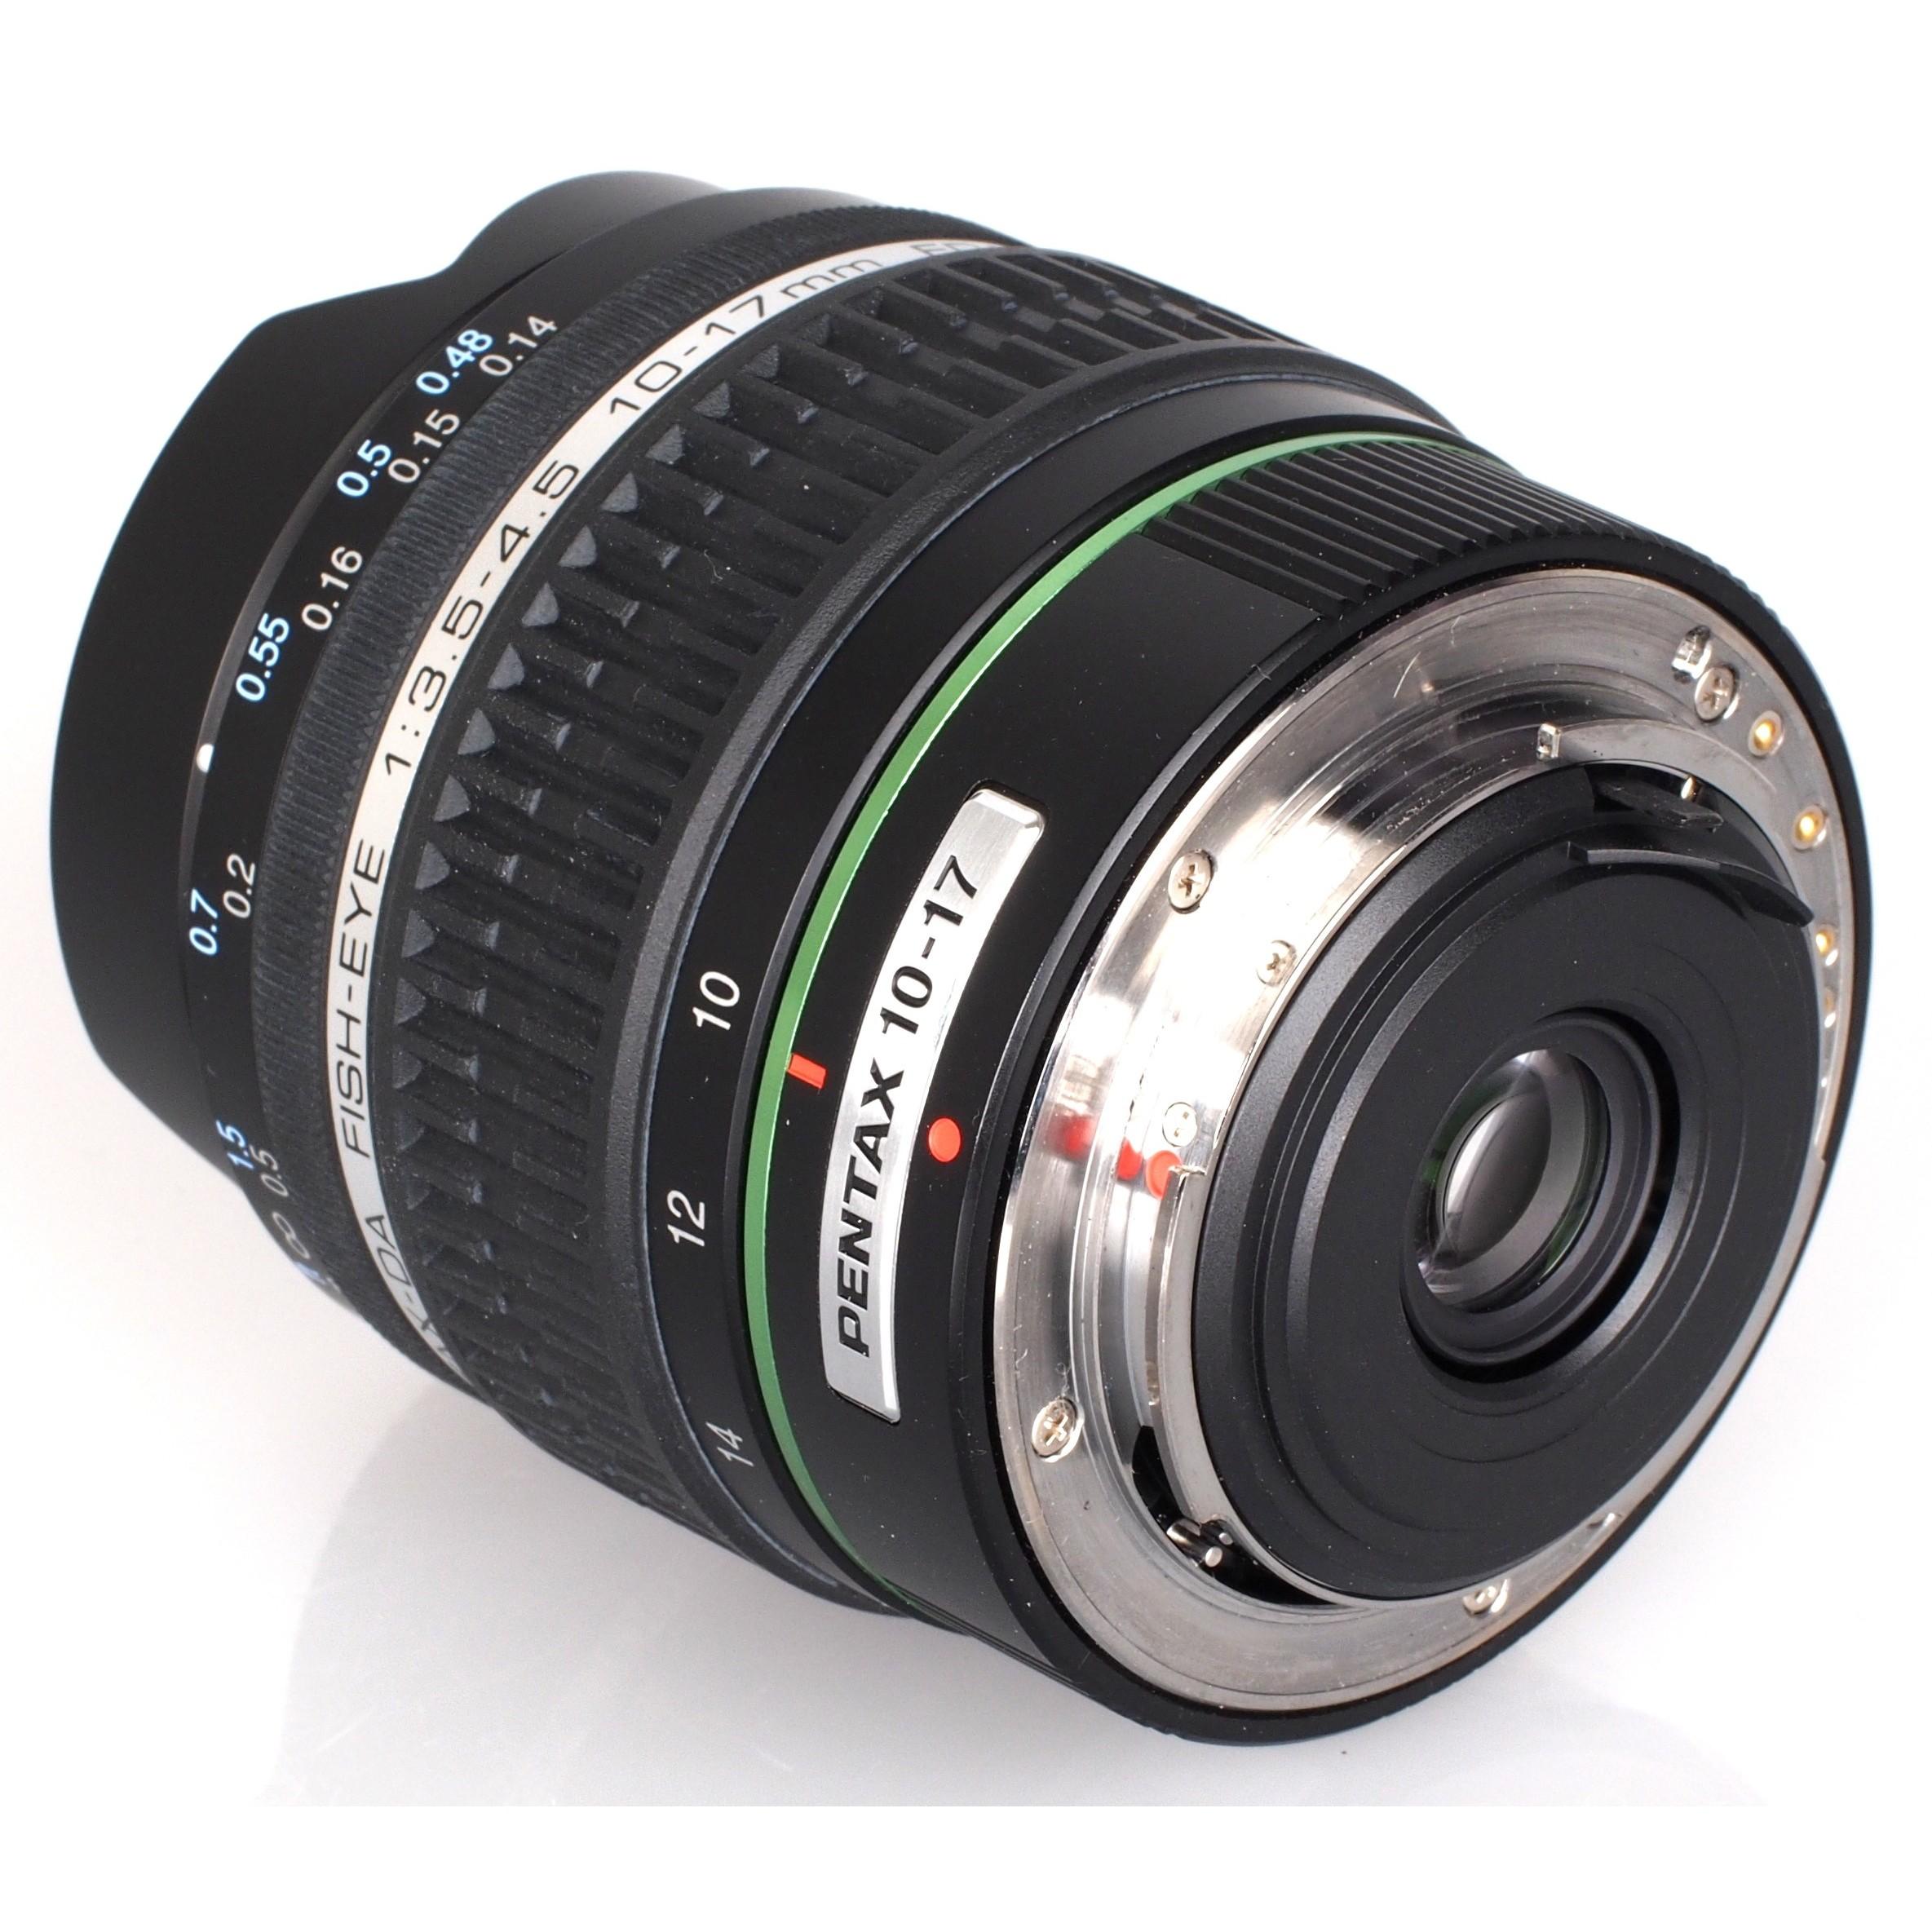 Объектив Pentax SMC DA 10-17mm f/3.5-4.5 ED (IF) Fish-Eye